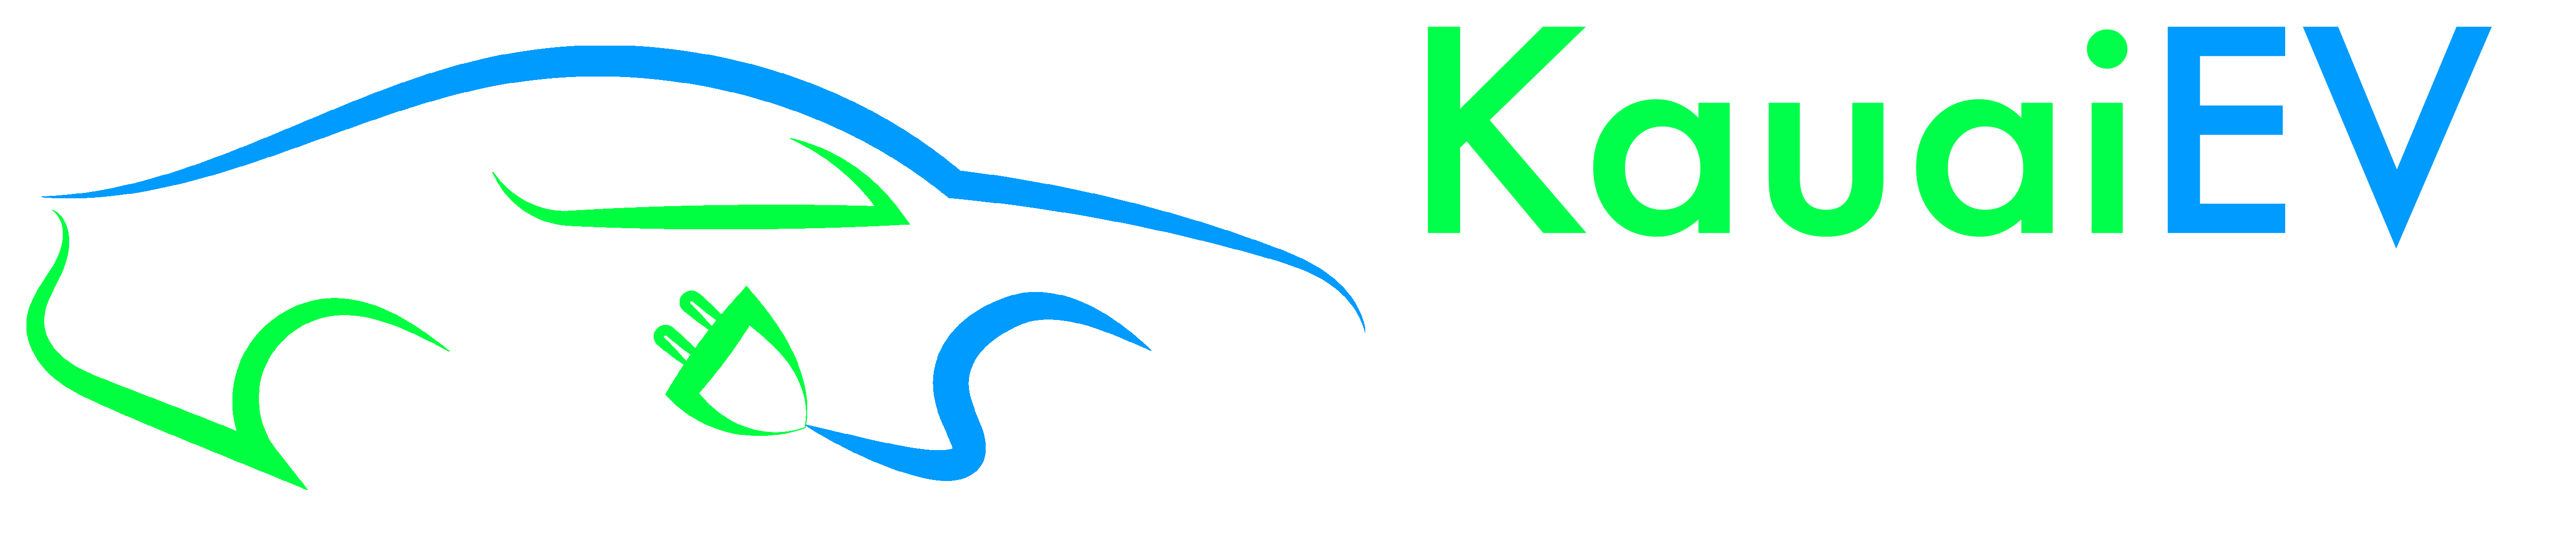 KauaiEV